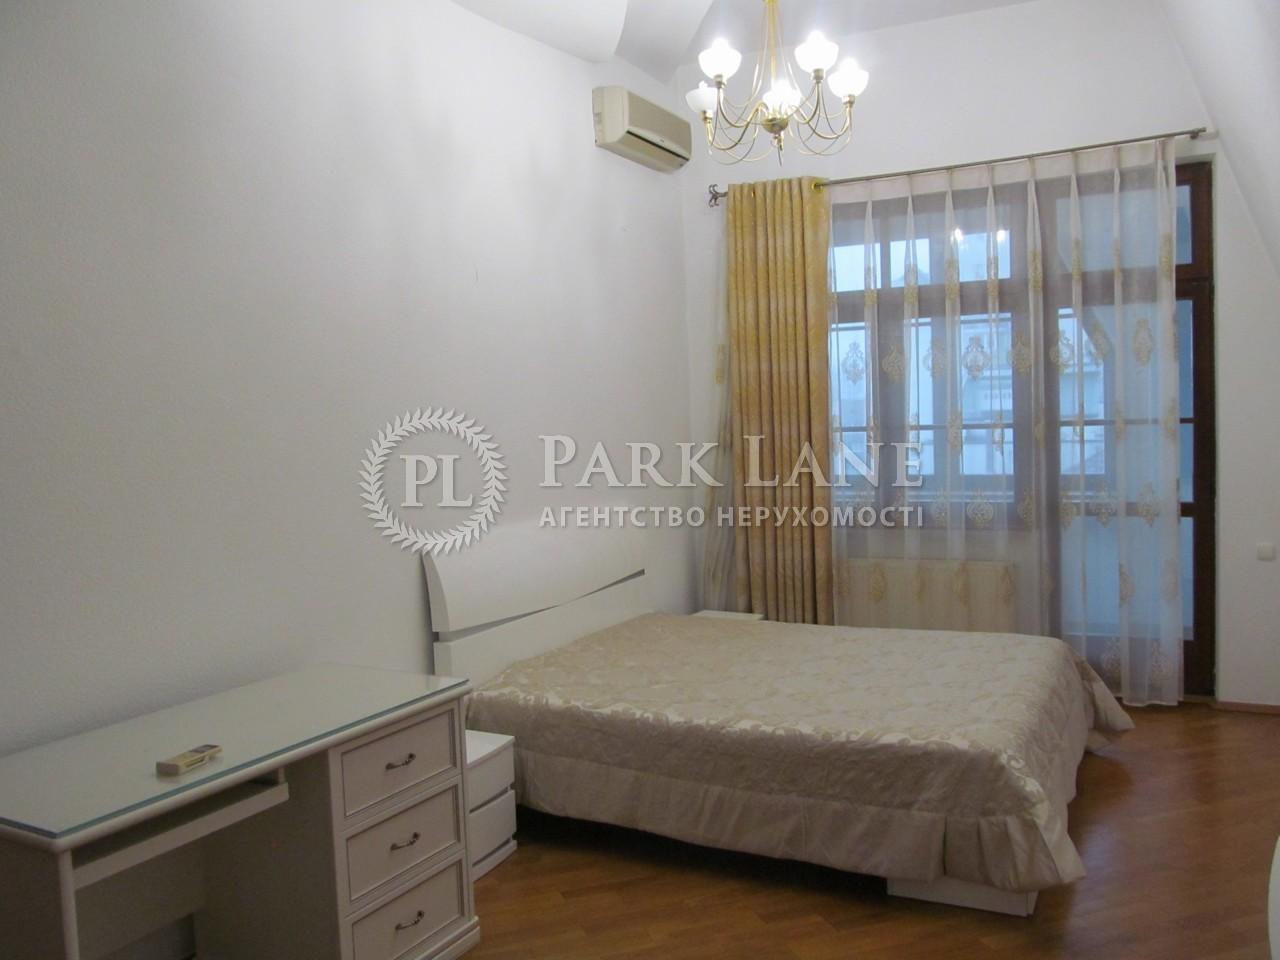 Квартира ул. Павловская, 18, Киев, C-72808 - Фото 17